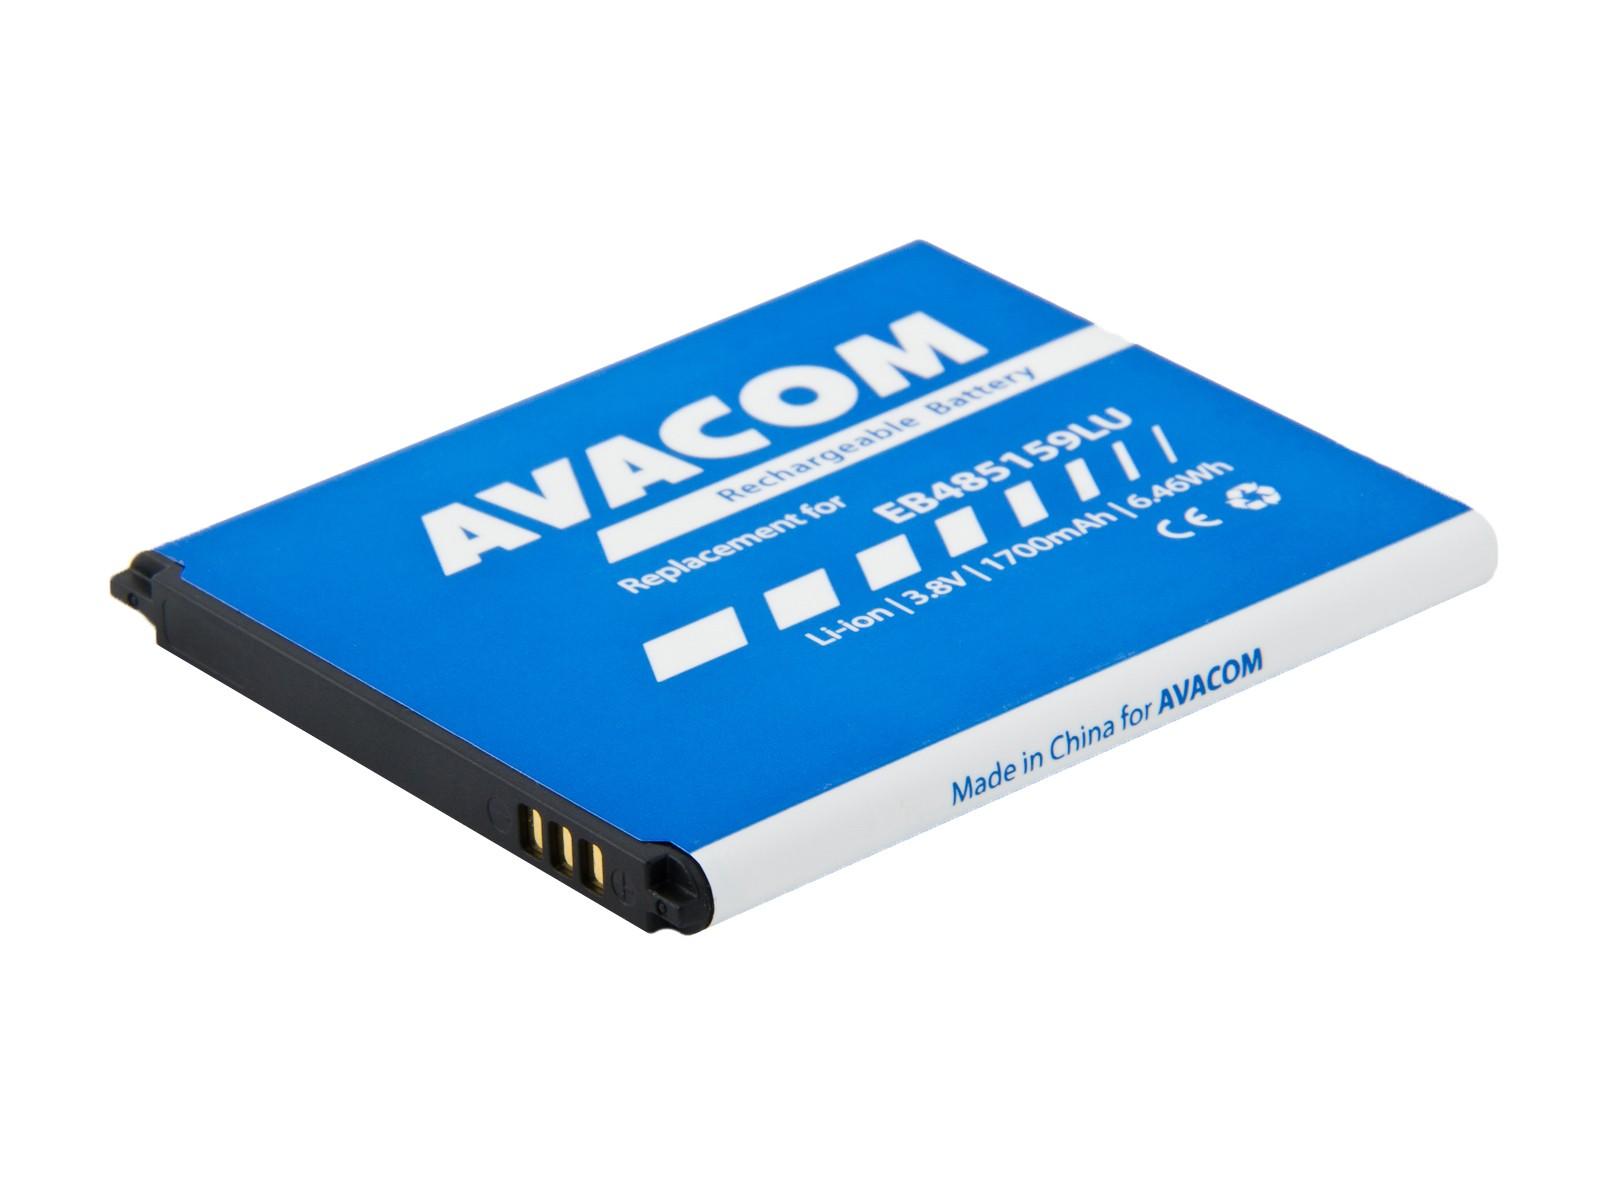 Baterie AVACOM GSHT-S640-1600 do mobilu HTC Titan Li-Ion 3,8V 1600mAh, (náhrada BI39100)